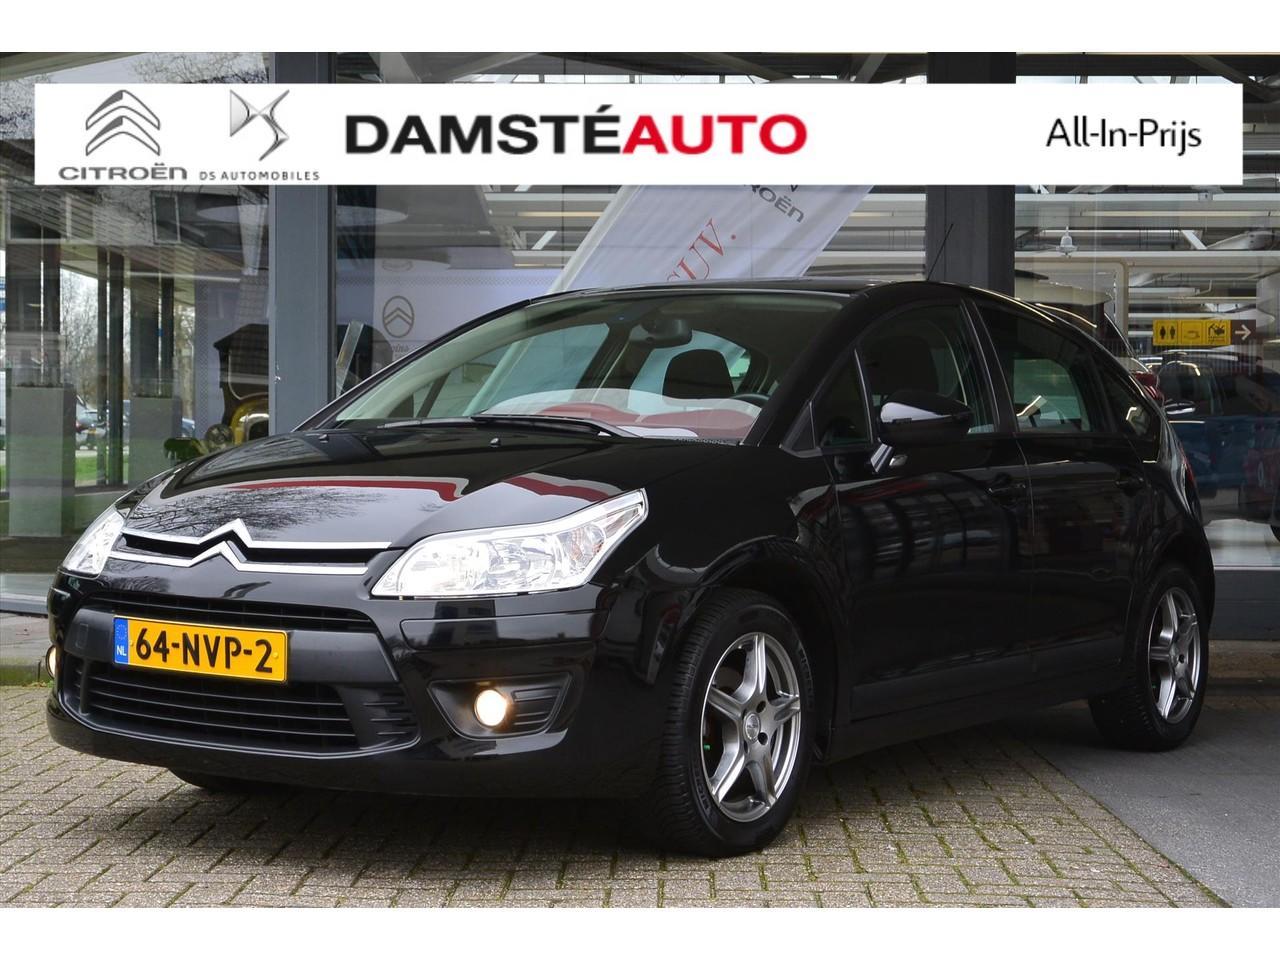 Citroën C4 1.6 vti berline anniversaire airco trekhaak